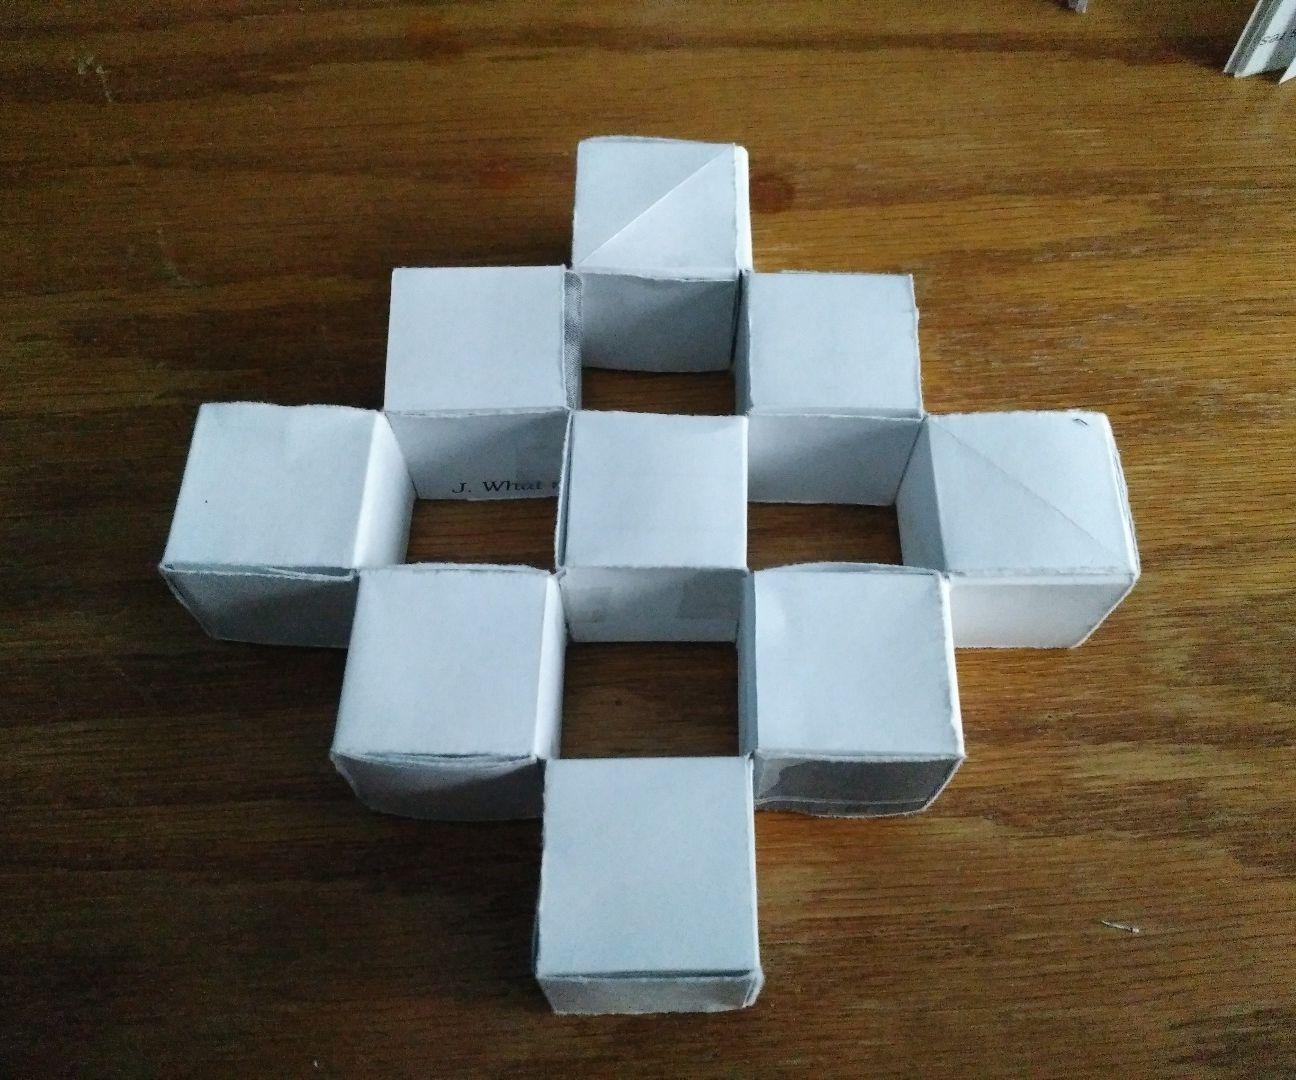 How to Make Magic Cubes